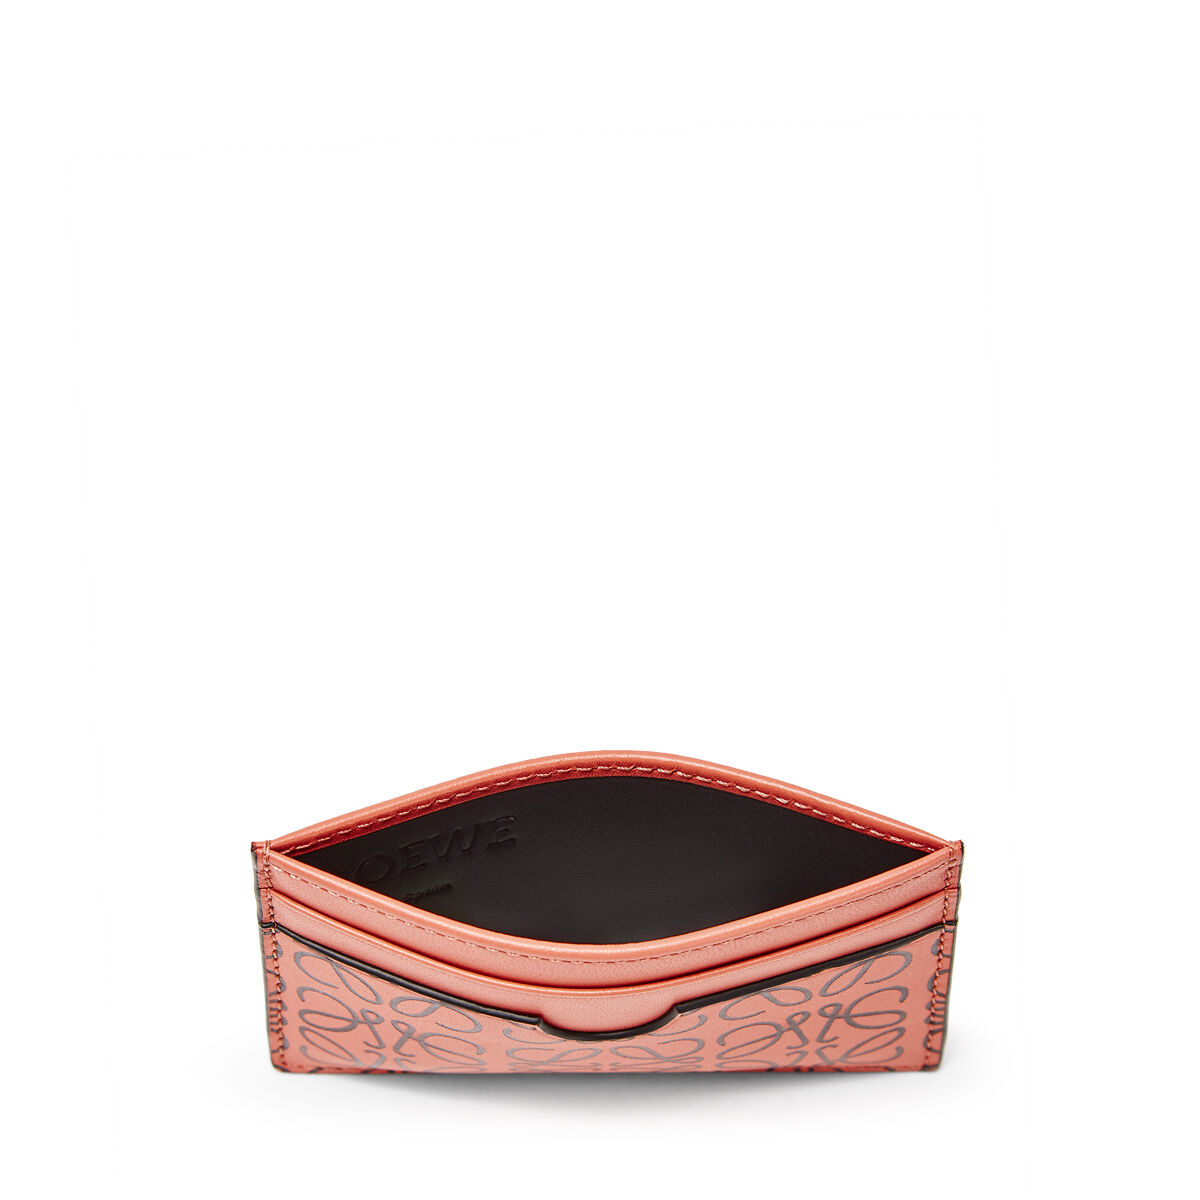 LOEWE Plain Card Holder Pink Tulip/Black all